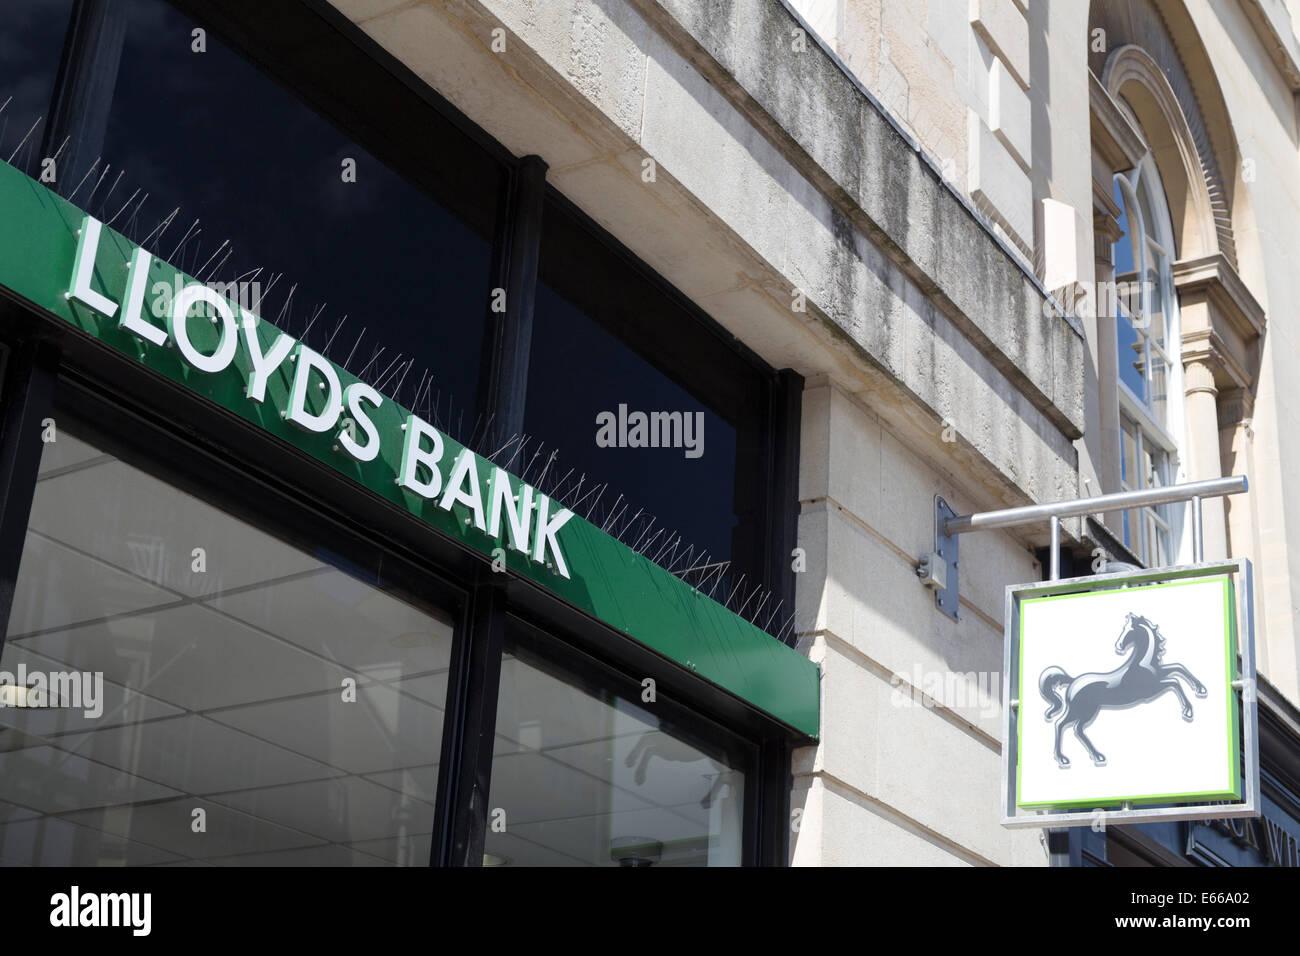 UK, Oxford, Lloyds Bank signage outside branch. - Stock Image